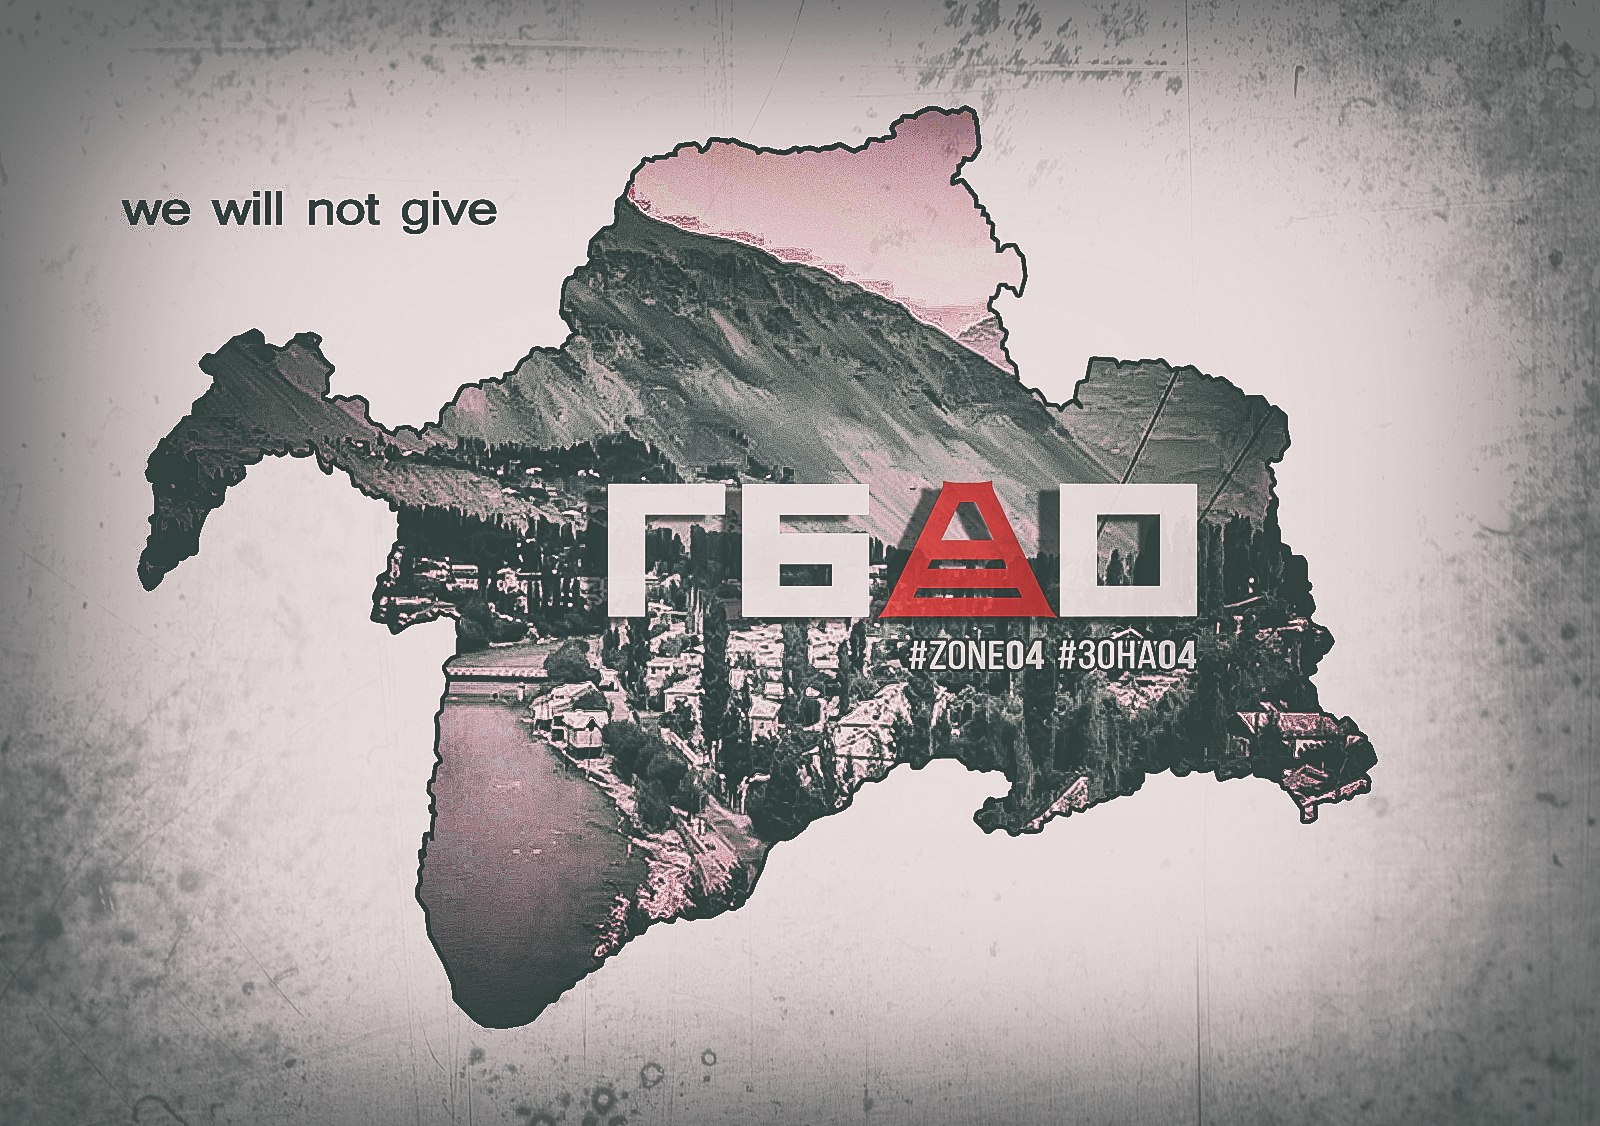 Berg-Badachschan politisches Plakat